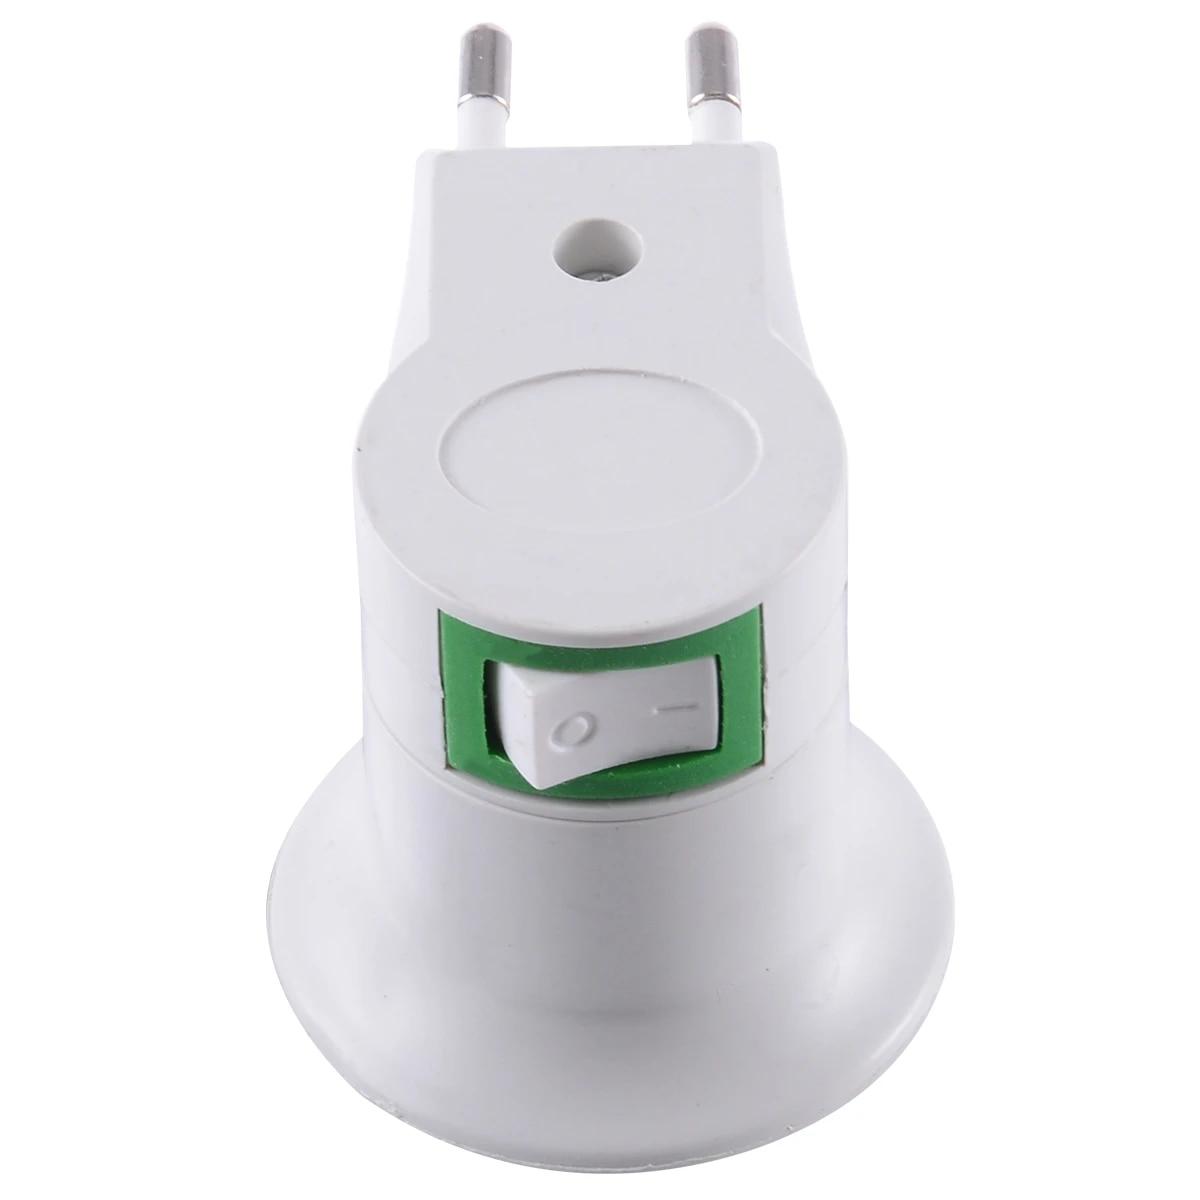 E27 LED Lamp Bulb Socket Base Holder Converter Adapter Socket With On//Off Switch